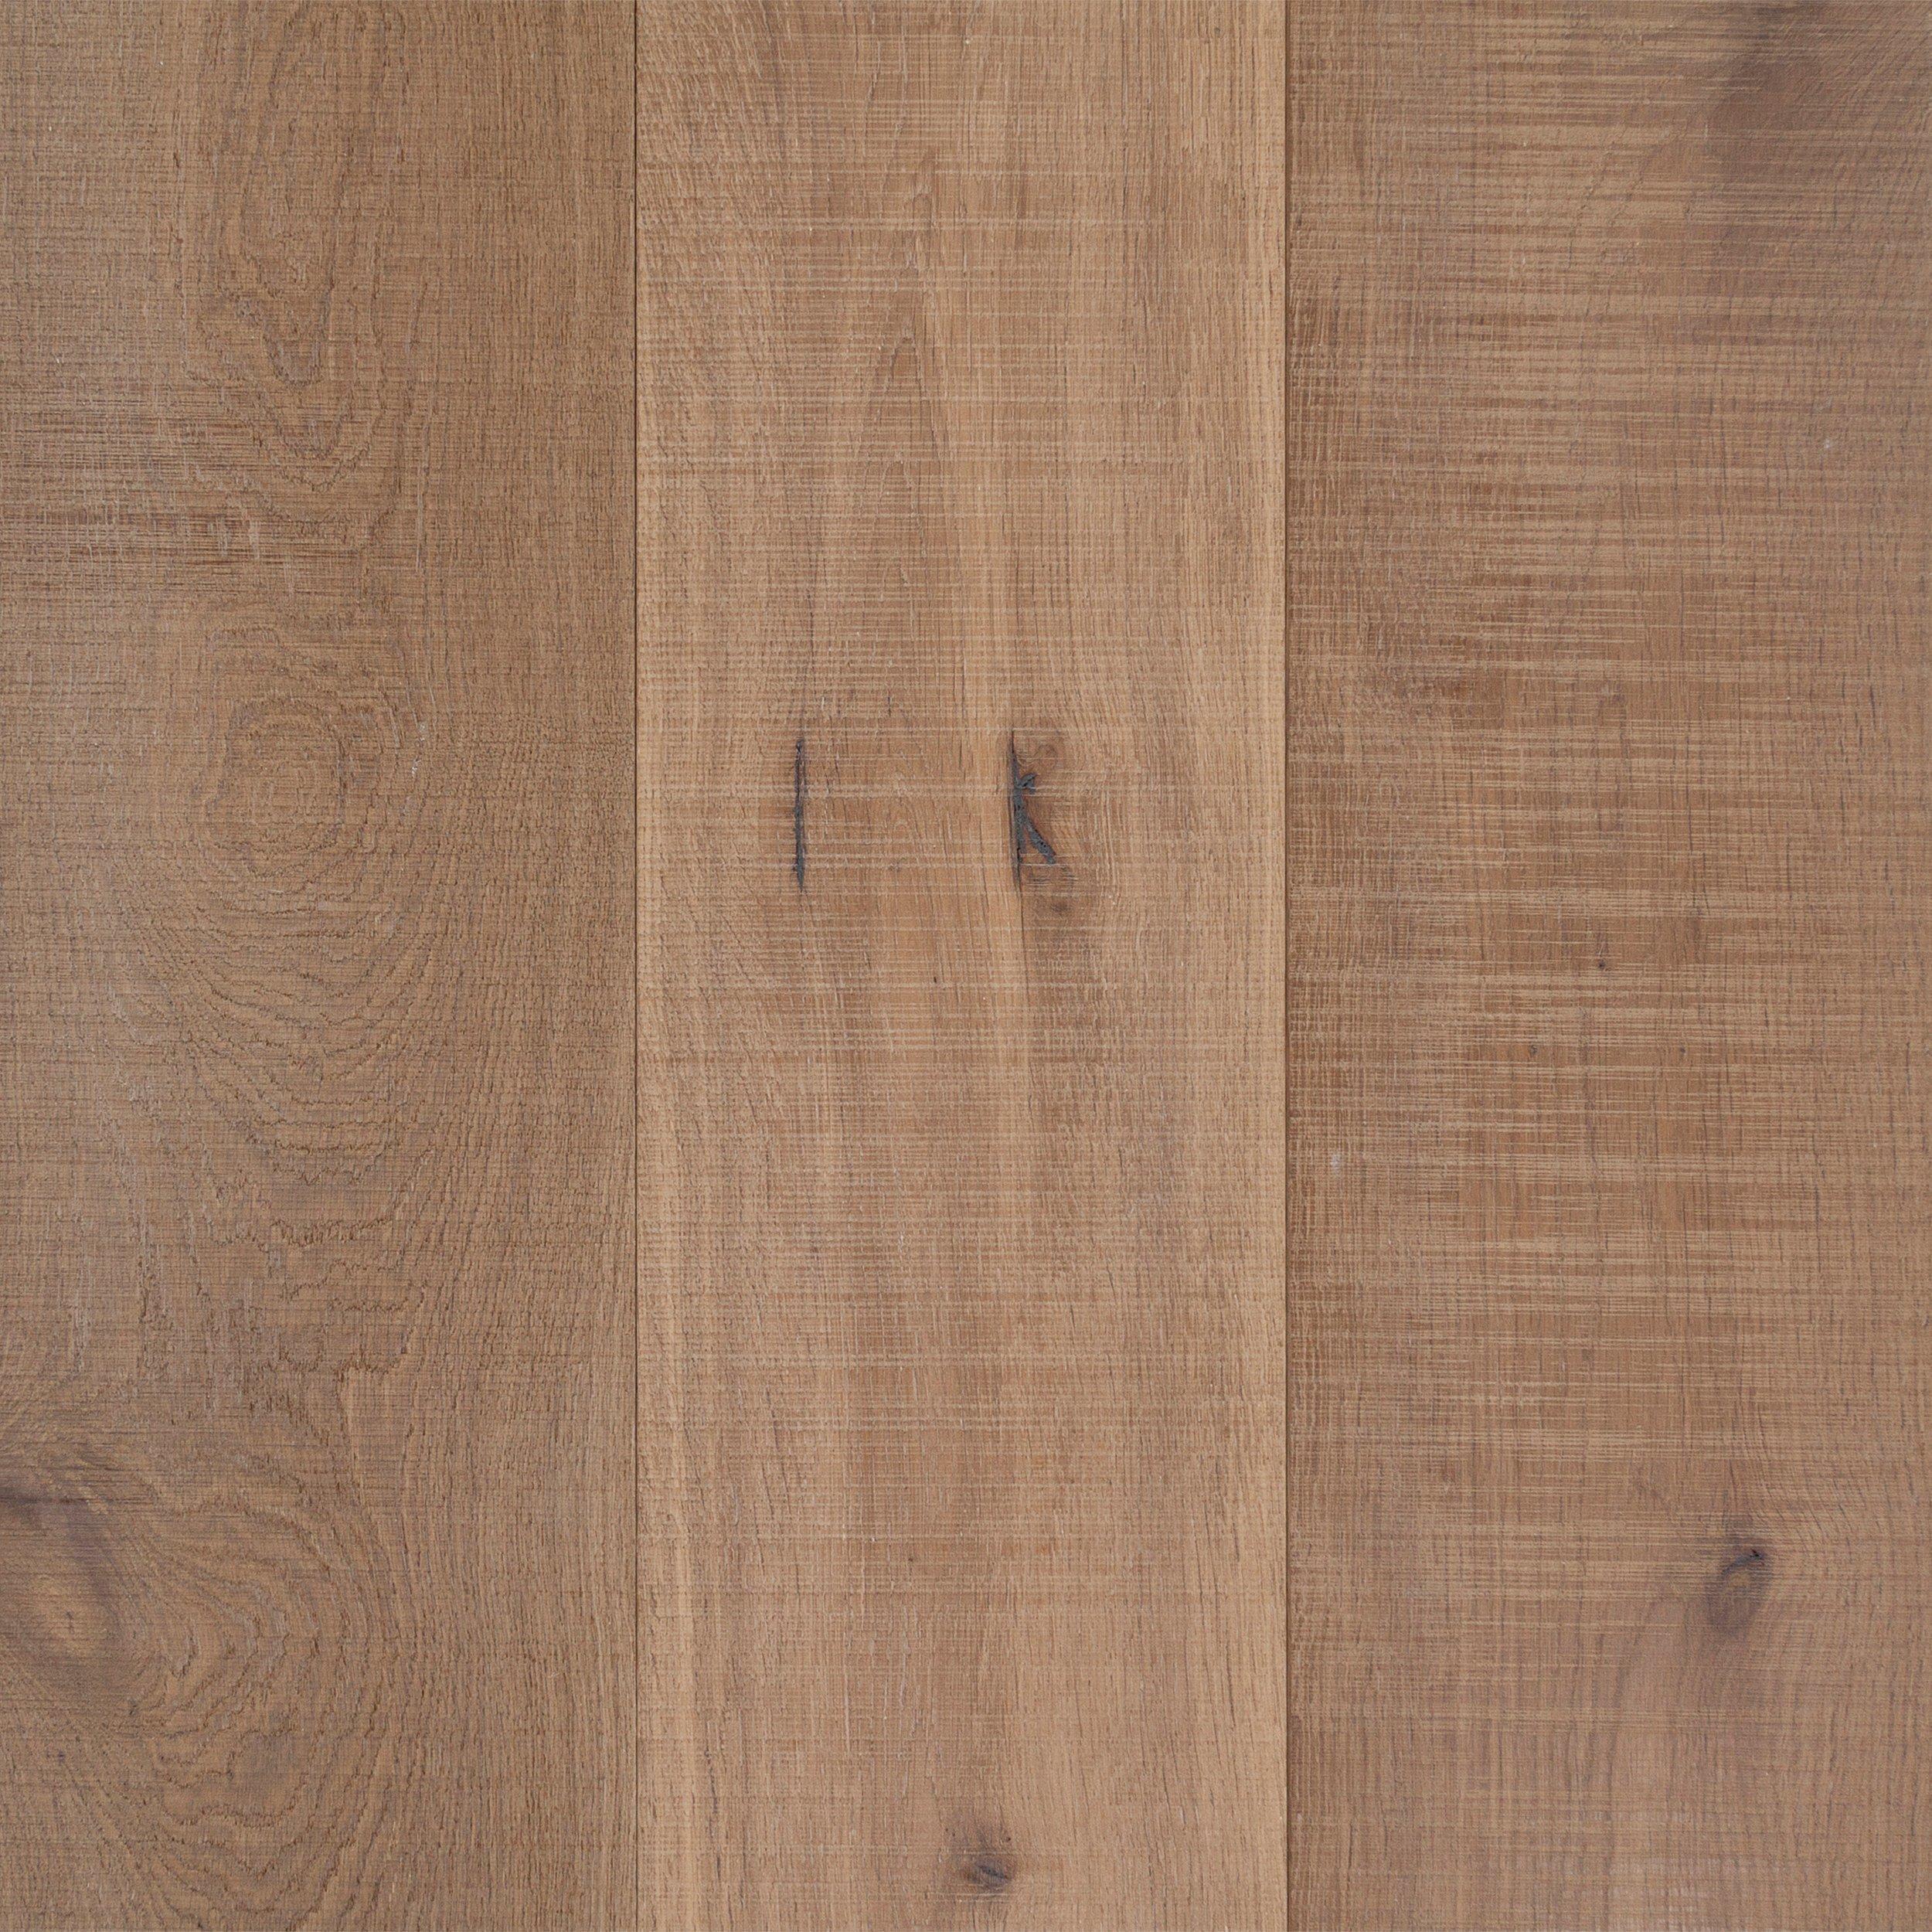 Floor Decor Dallas Montpellier Oak Engineered Hardwood 9 16in X 8 3 4in